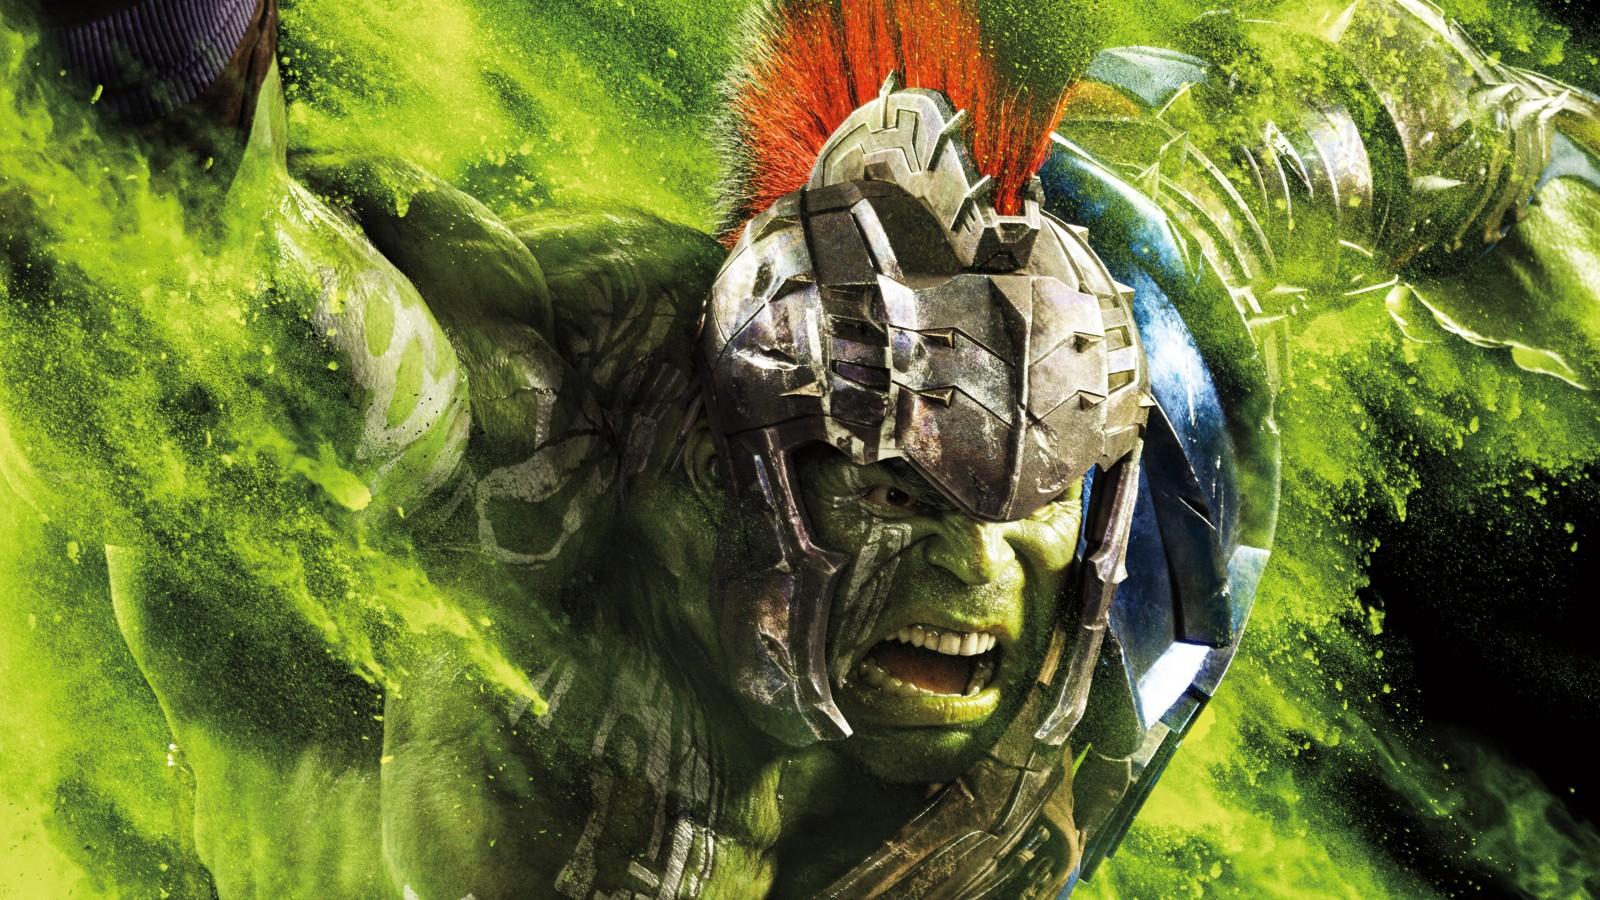 Iphone X Wallpaper Official Download Thor Ragnarok Mark Ruffalo As Hulk 5k Wallpapers Hd